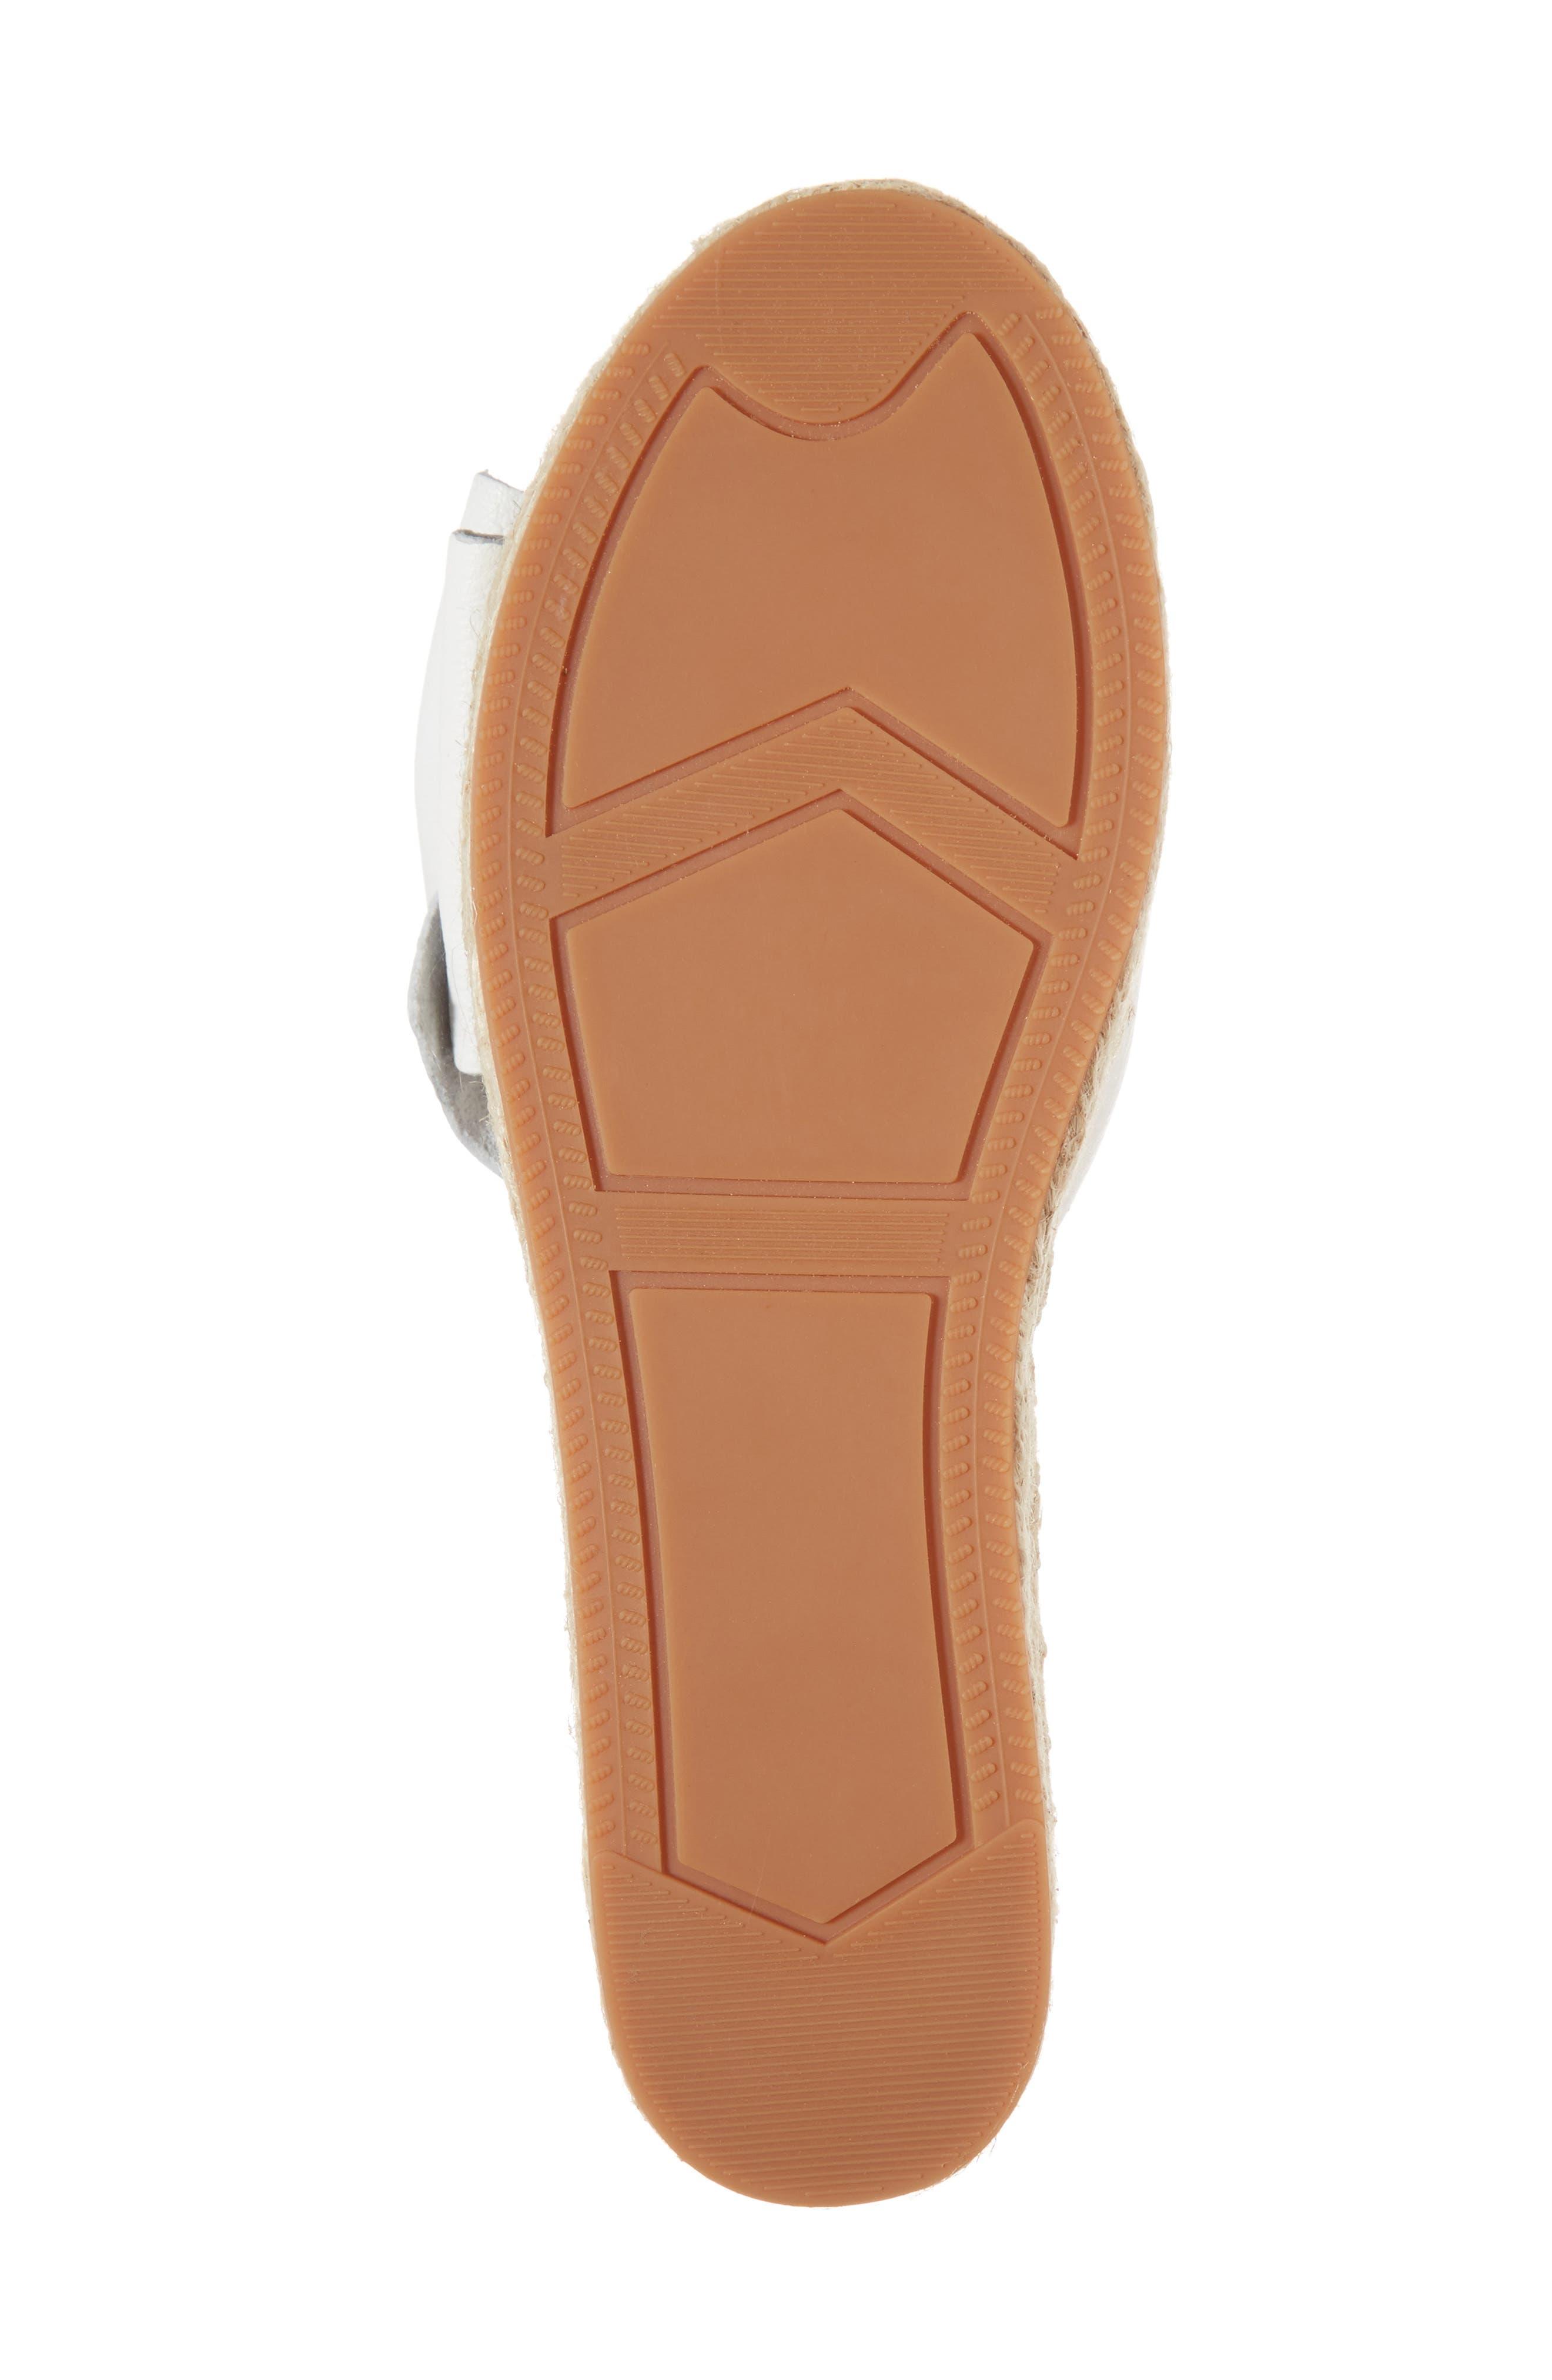 Giana Bow Slide Sandal,                             Alternate thumbnail 6, color,                             Optic White Leather